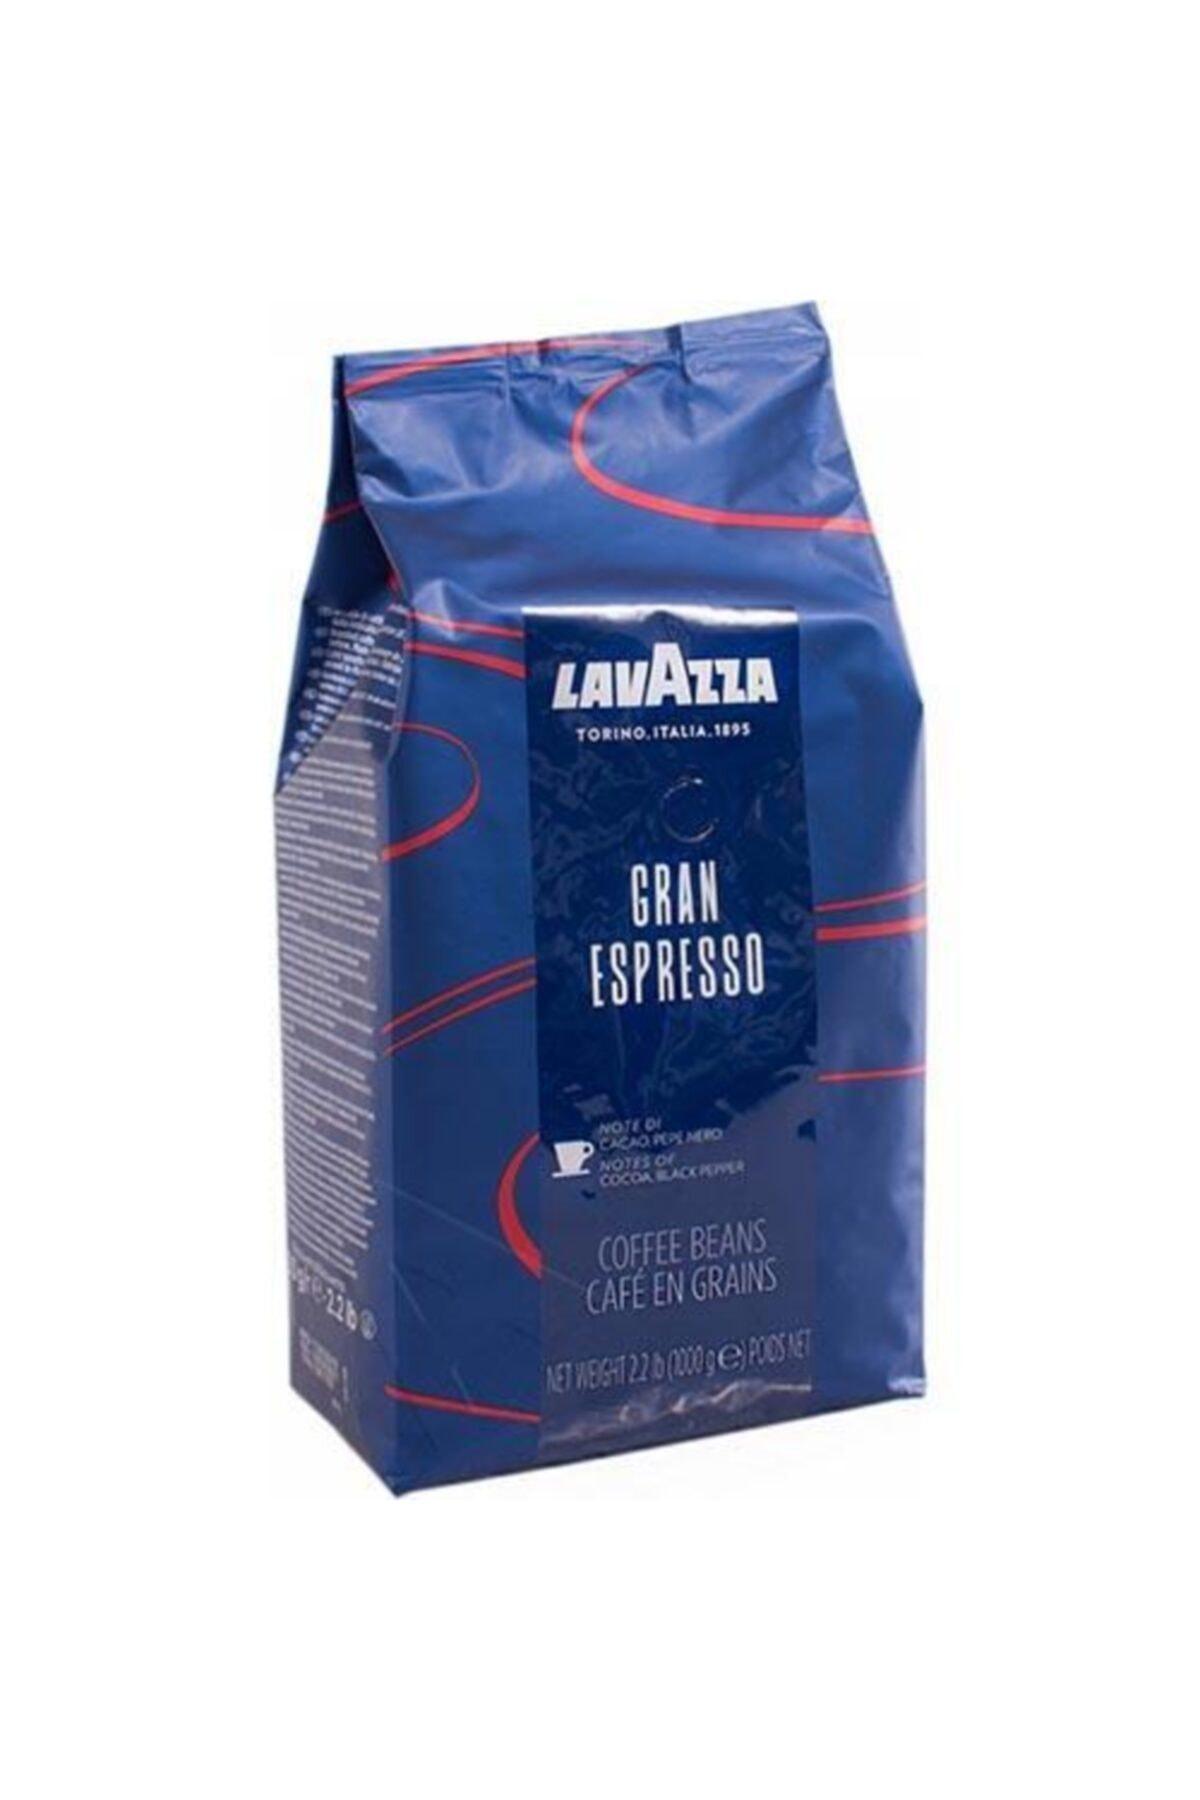 LavAzza Gran Espresso Blue Çekirdek Kahve 1 Kg 2